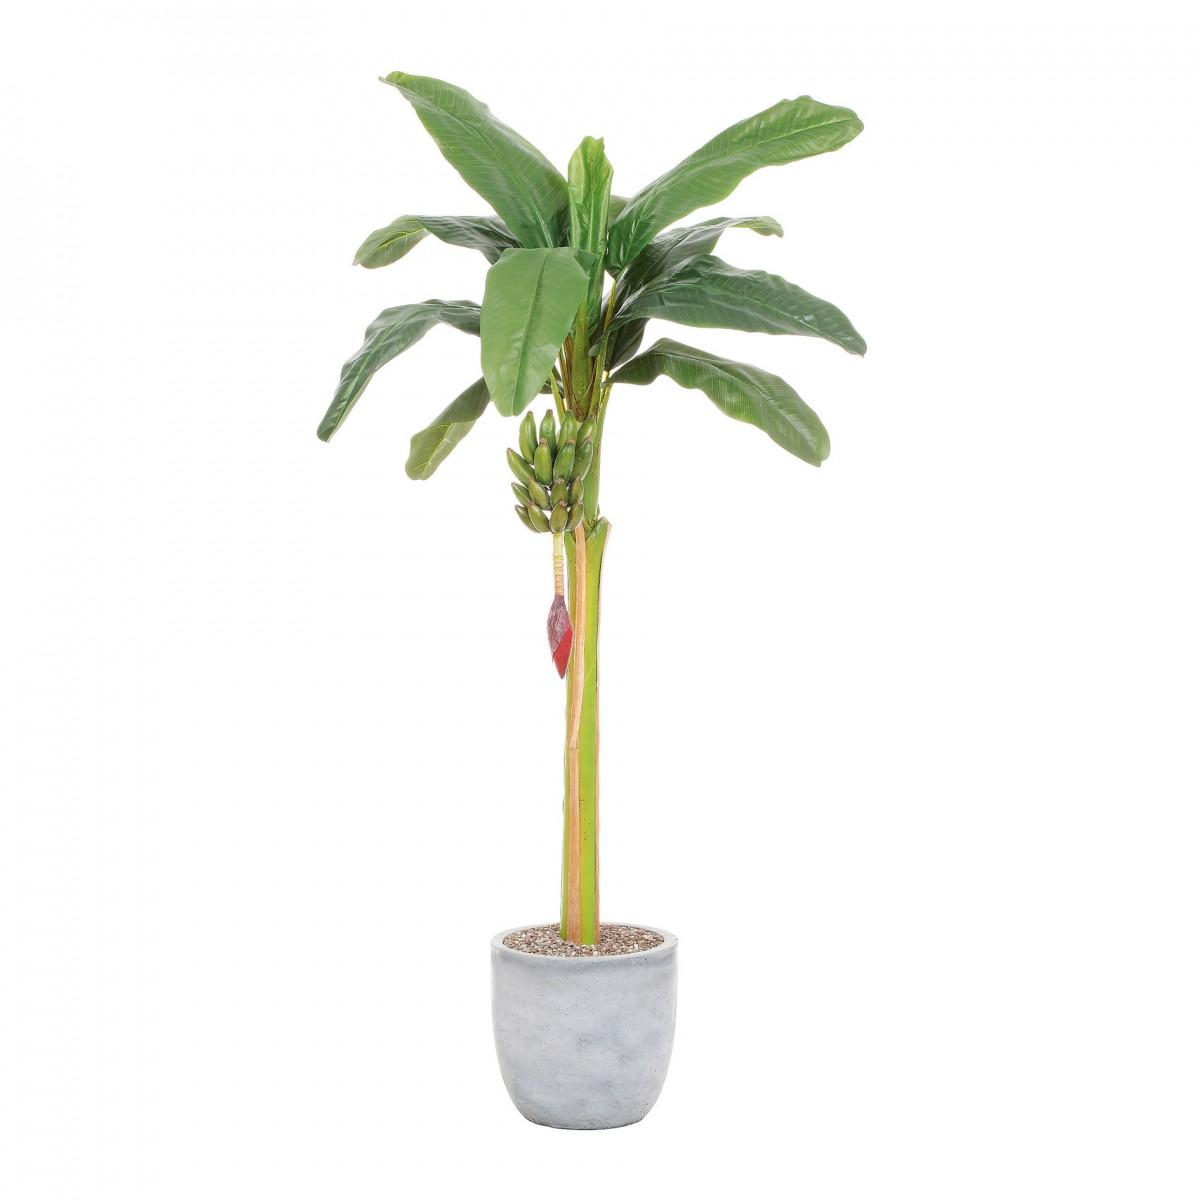 bananenbaum kunstpflanze 180cm staude im topf ebay. Black Bedroom Furniture Sets. Home Design Ideas